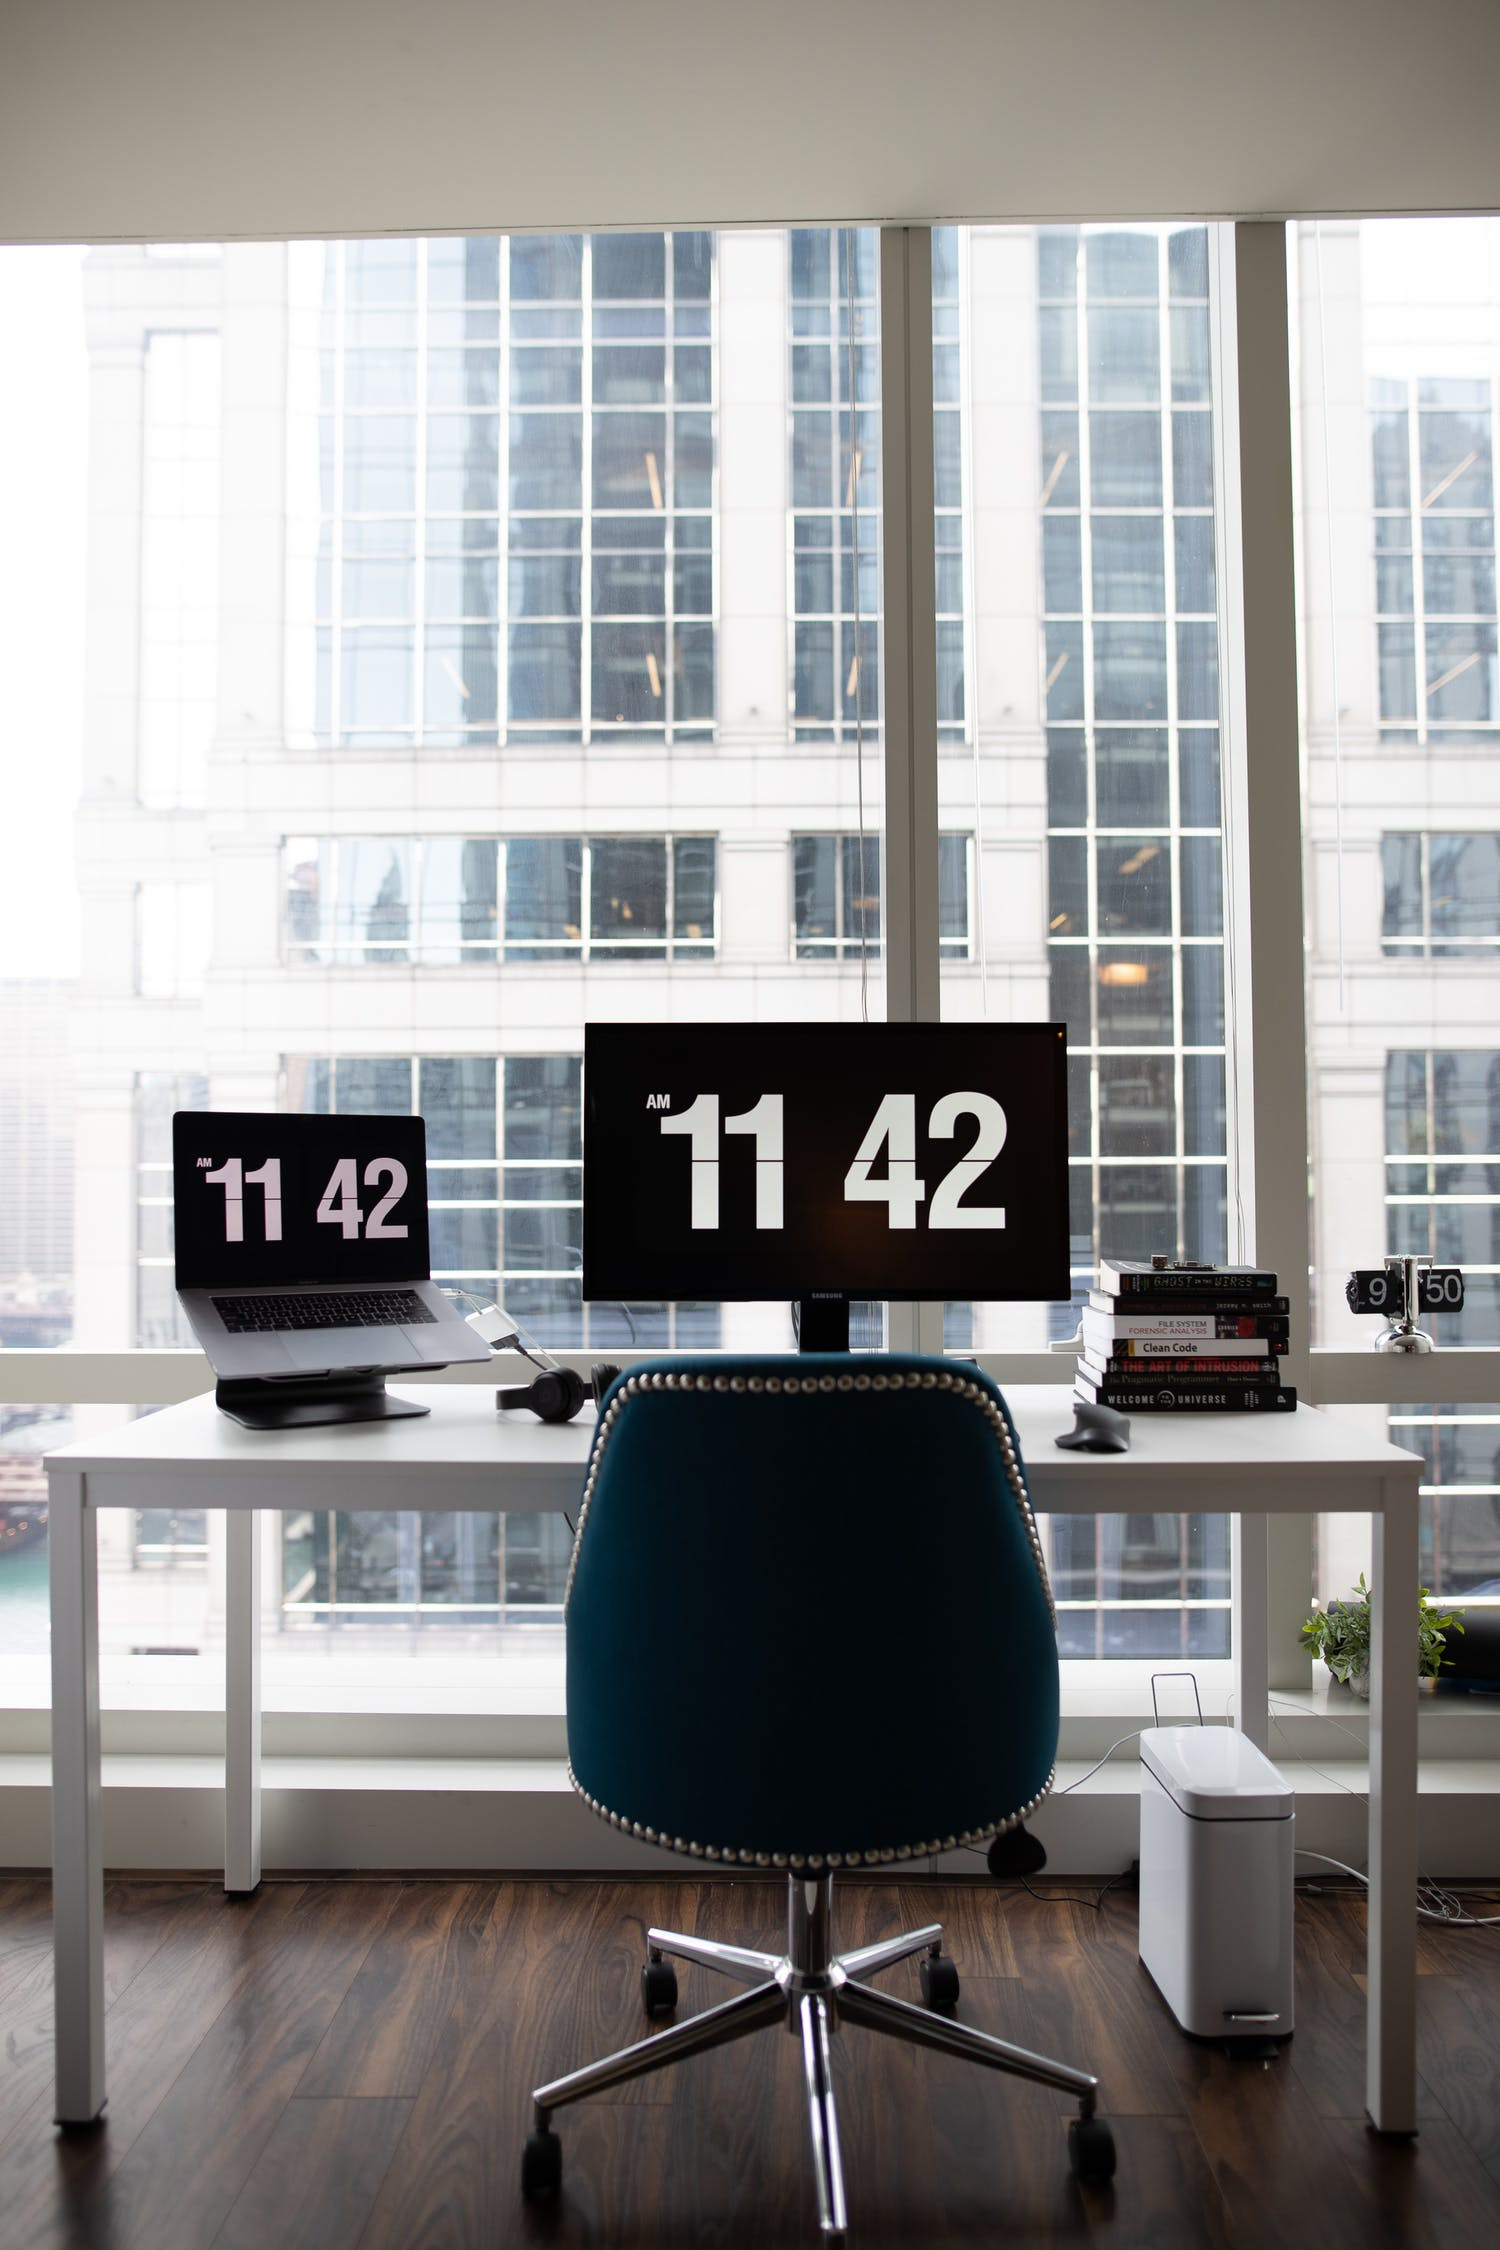 Flat Screen Monitor In An Office